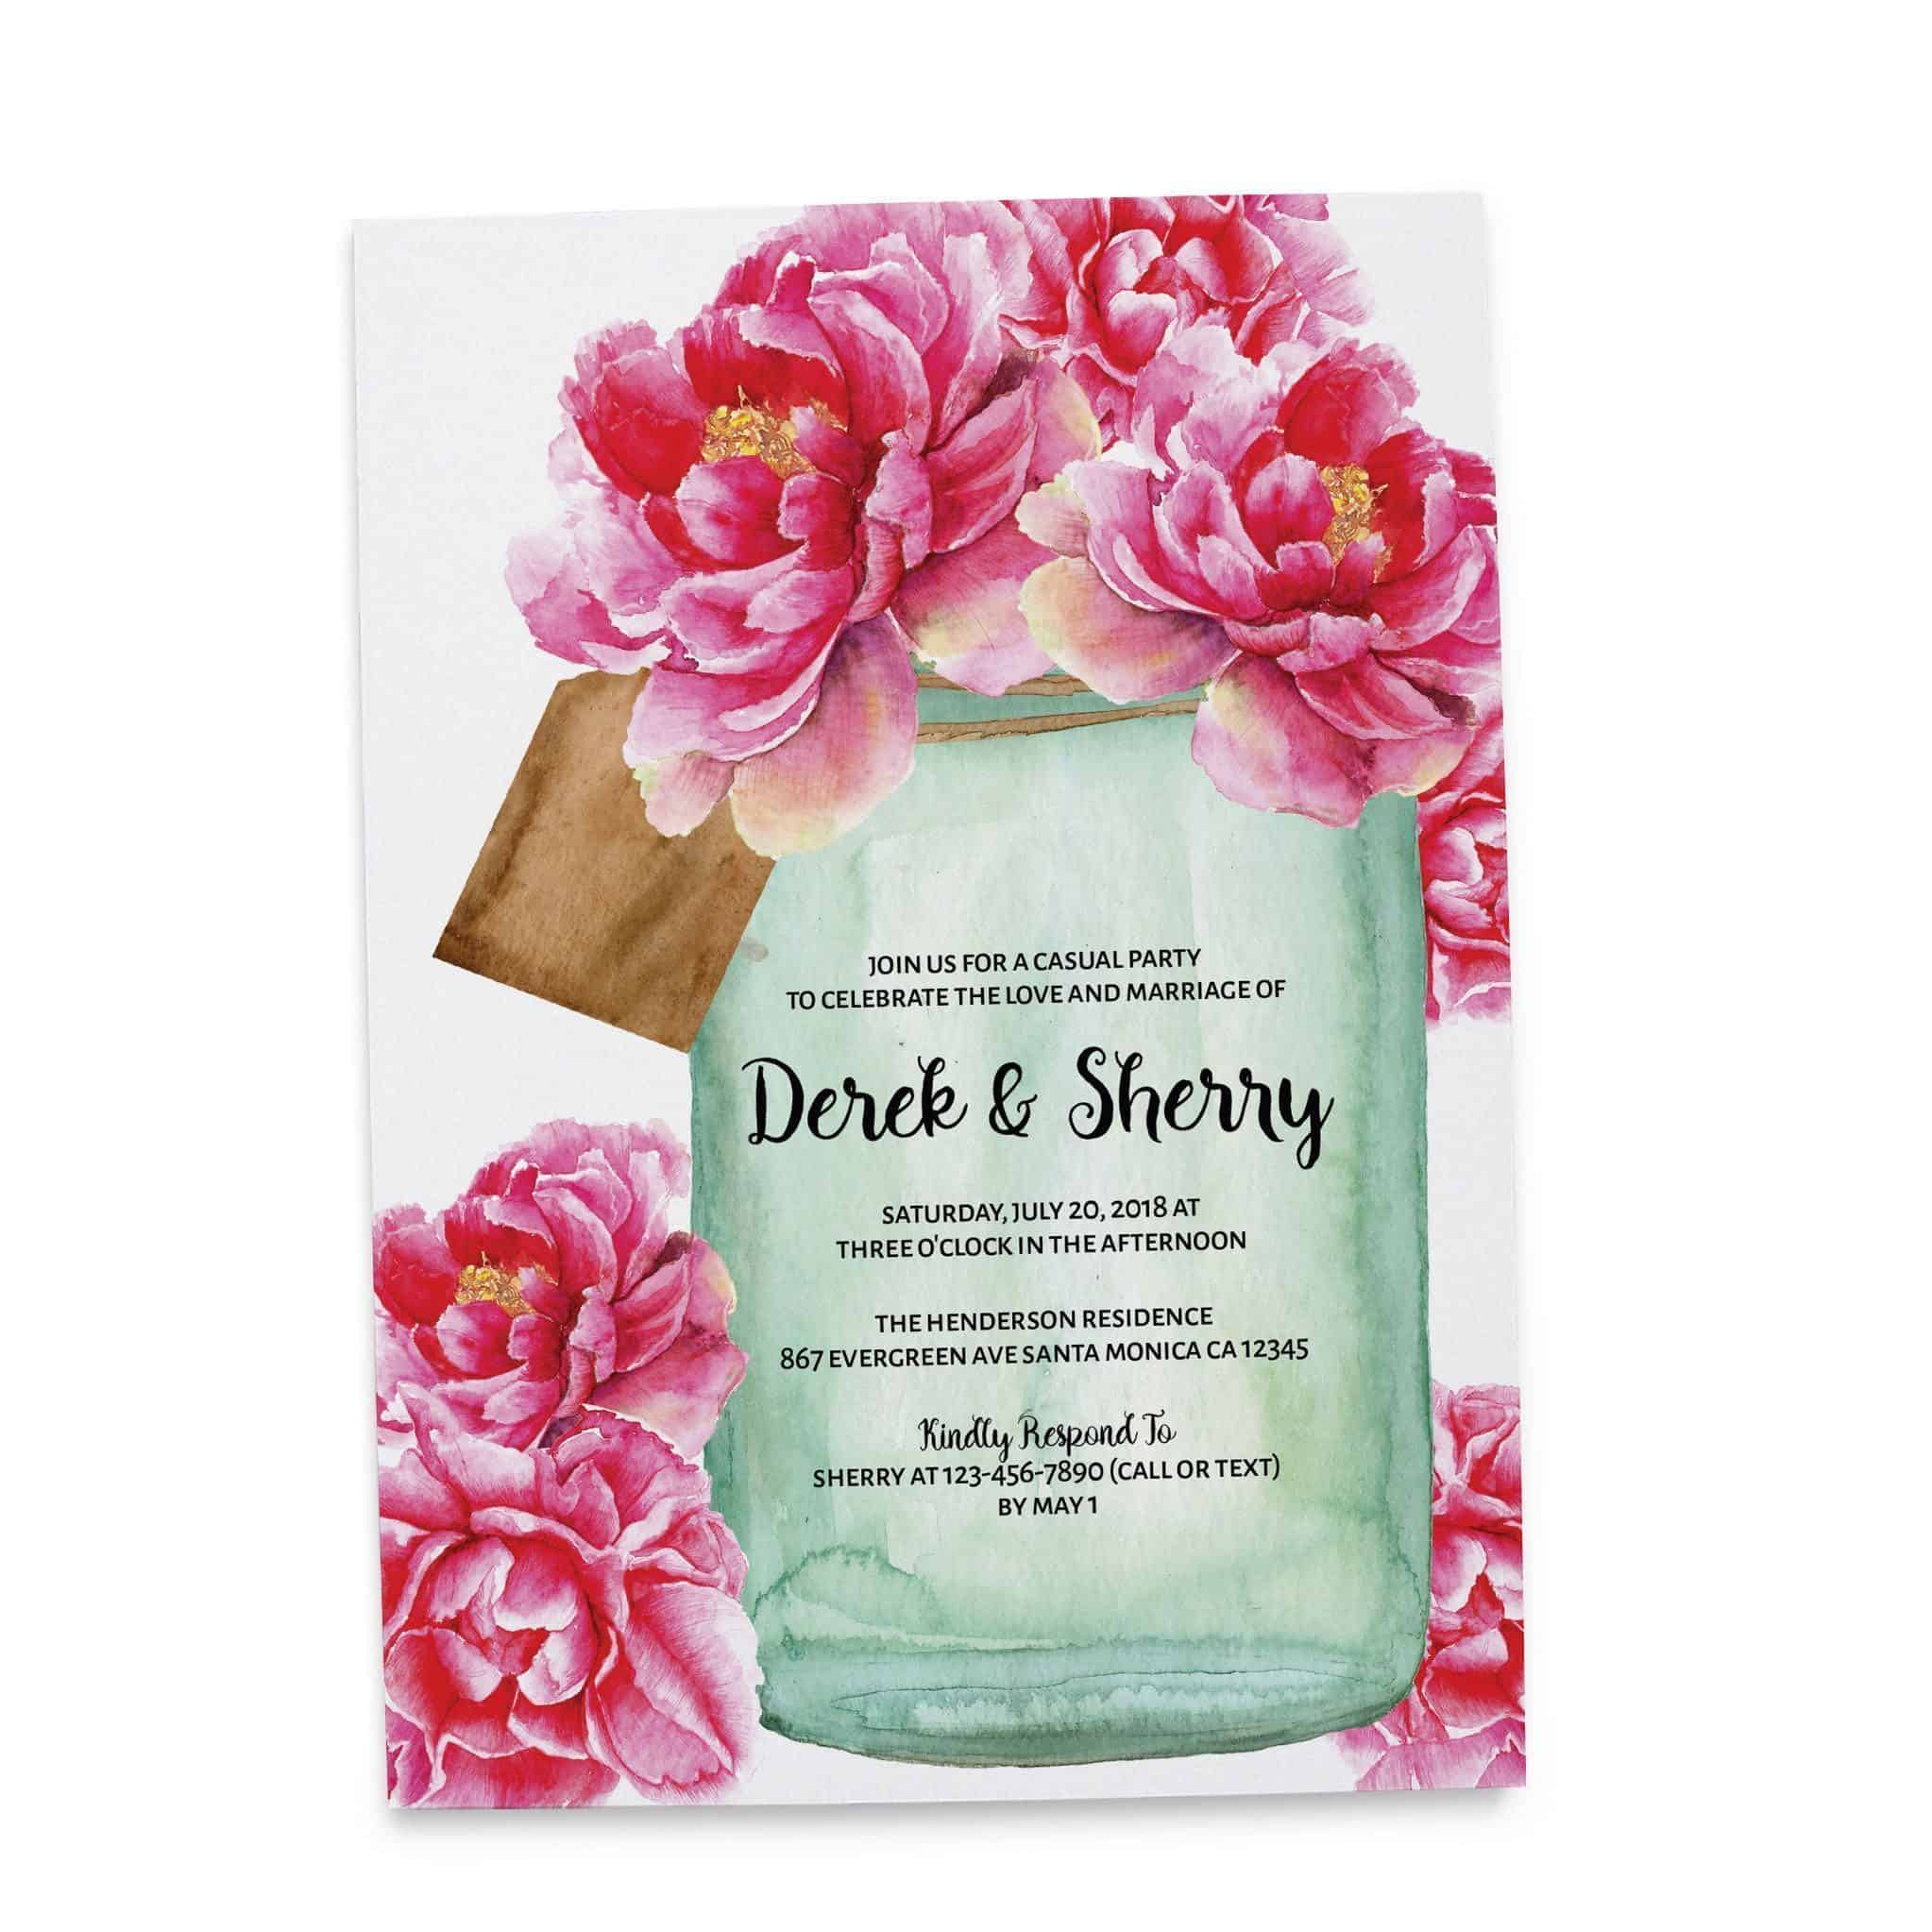 Rustic Mason Jars Wedding Reception Cards for Elopement Receptions ...